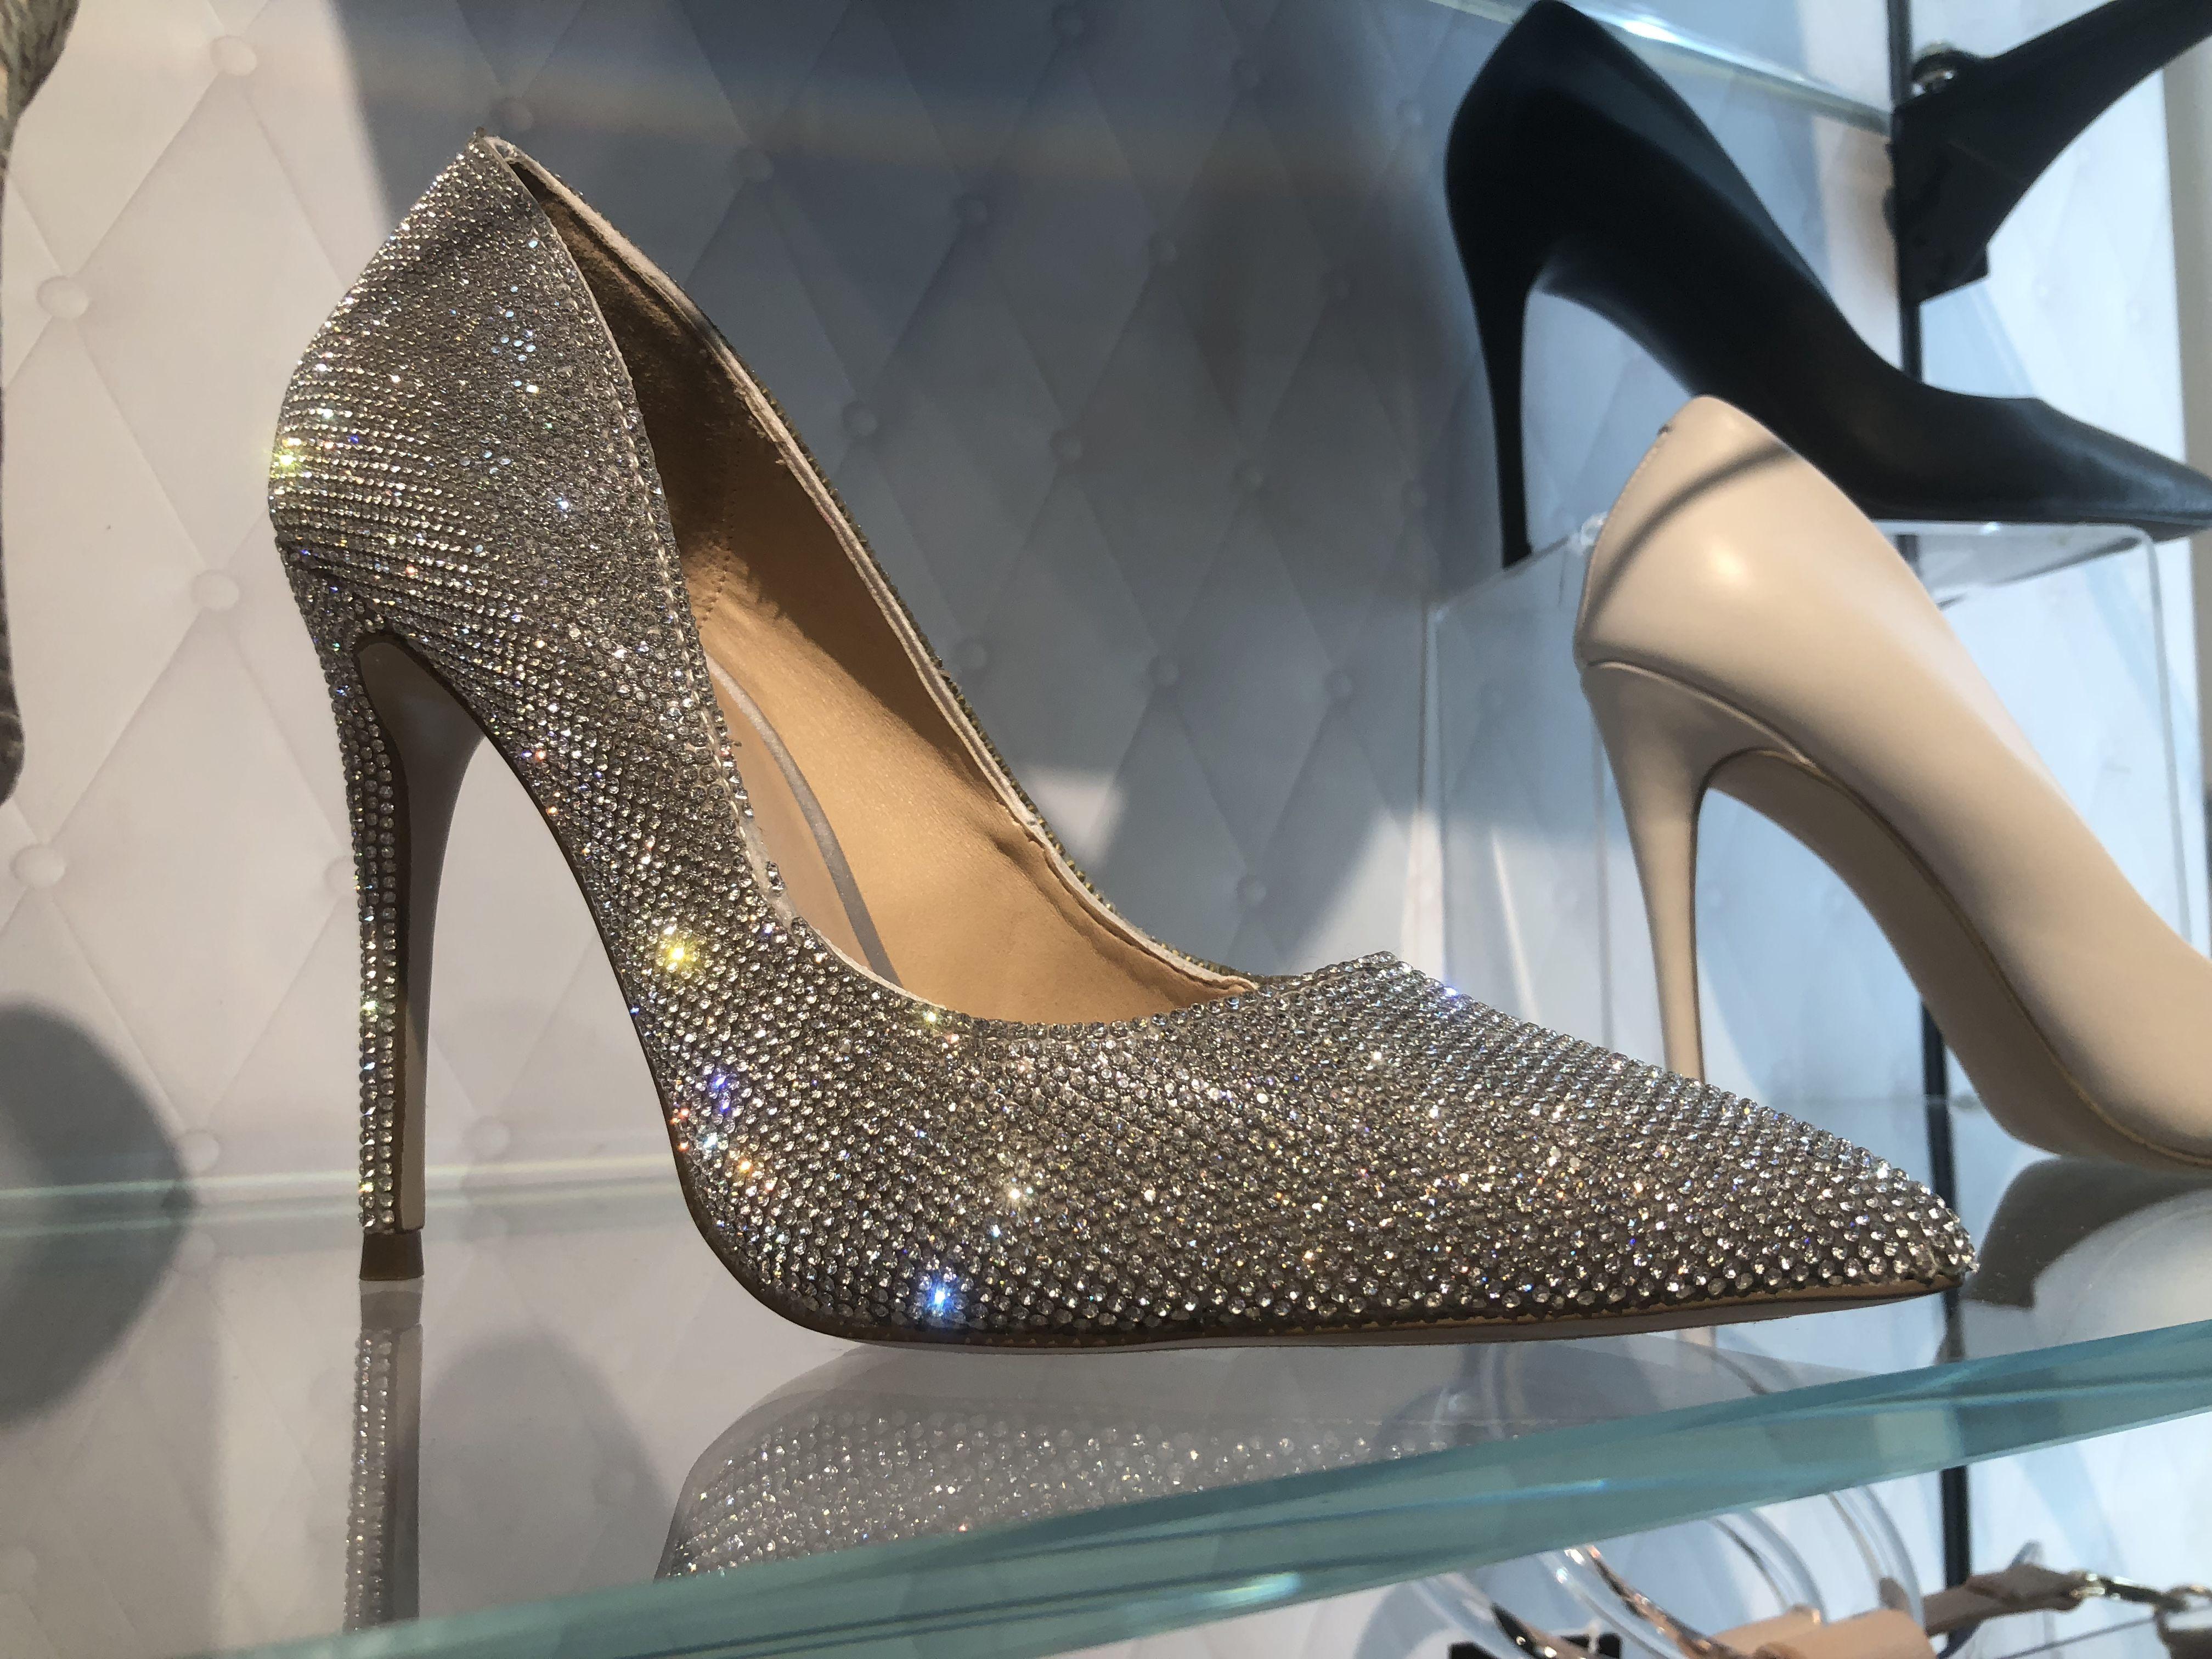 Steve madden pumps, Heels, Stiletto heels